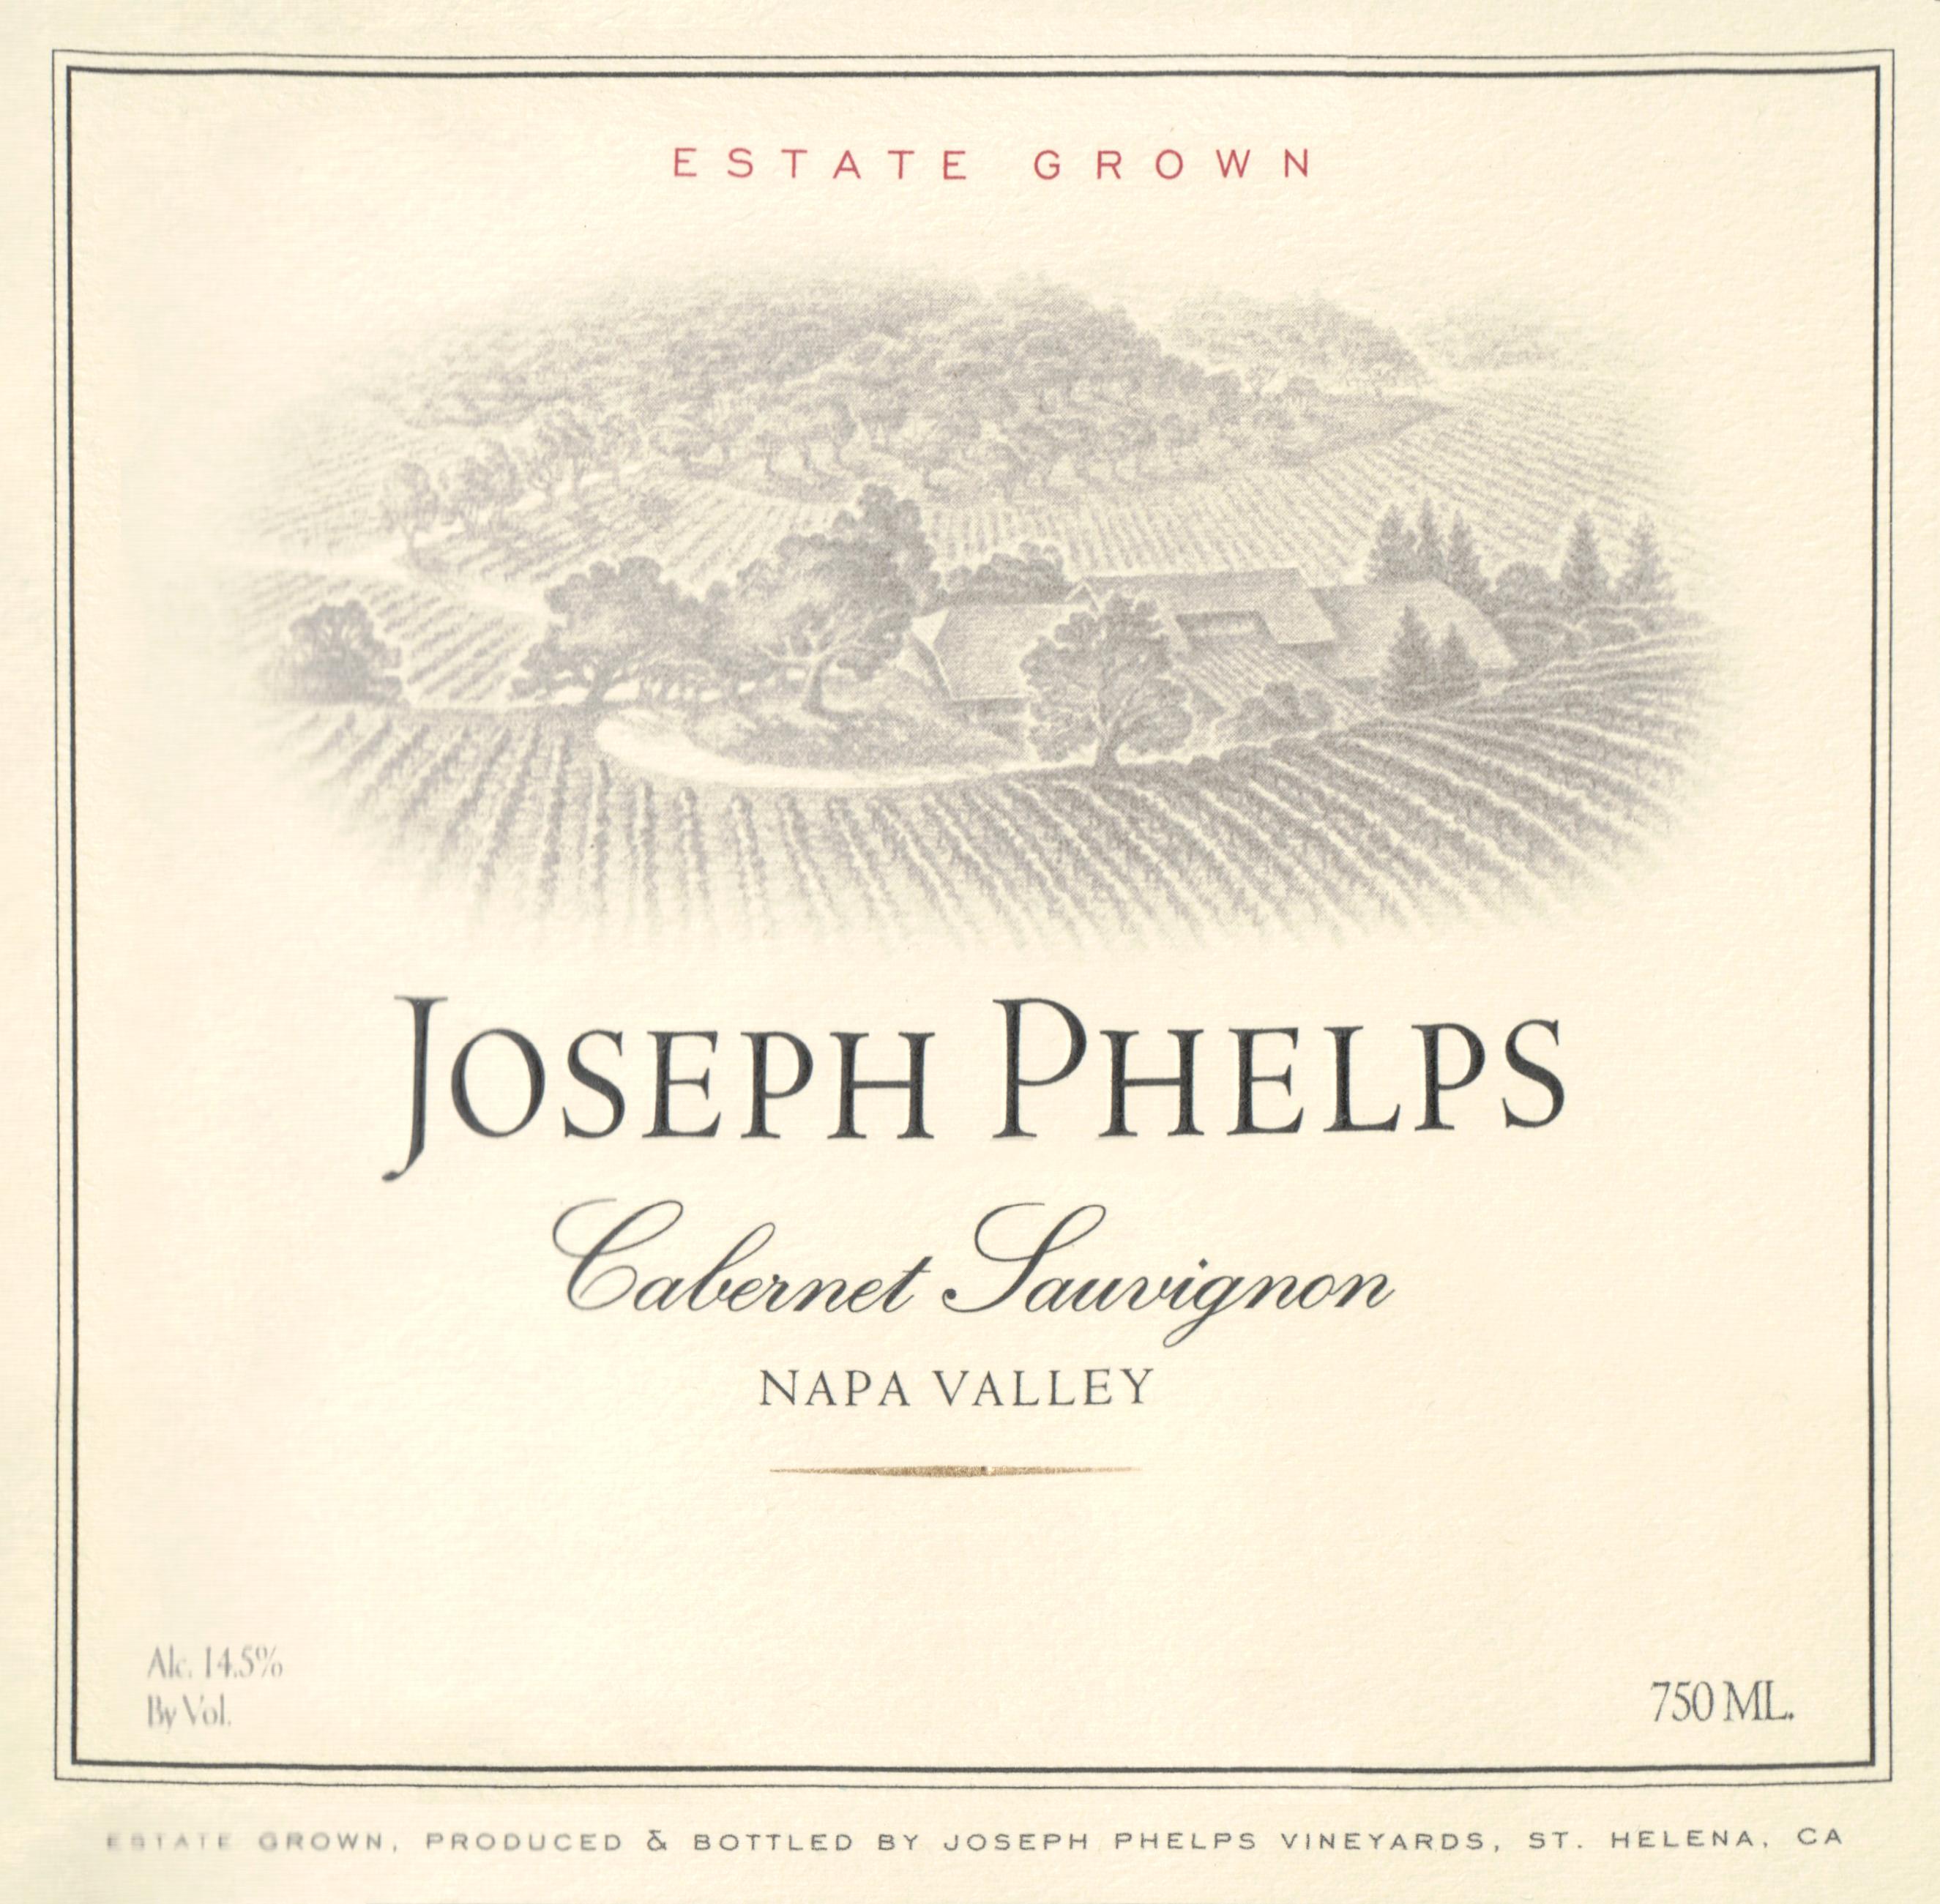 Joseph Phelps Cabernet Sauvignon 2017